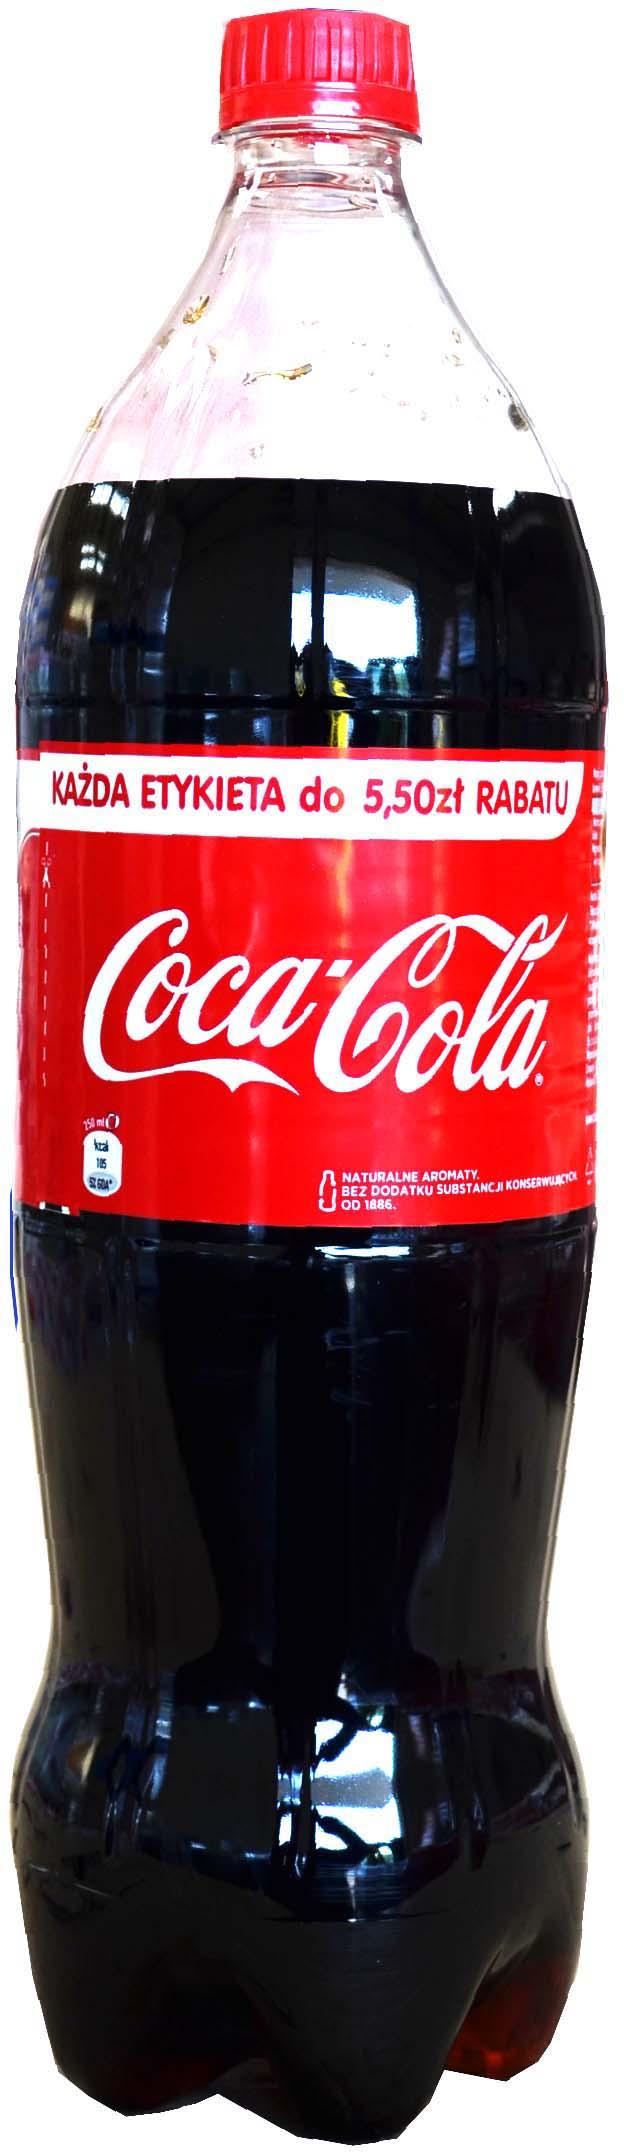 Coca Cola 1,5 l Image